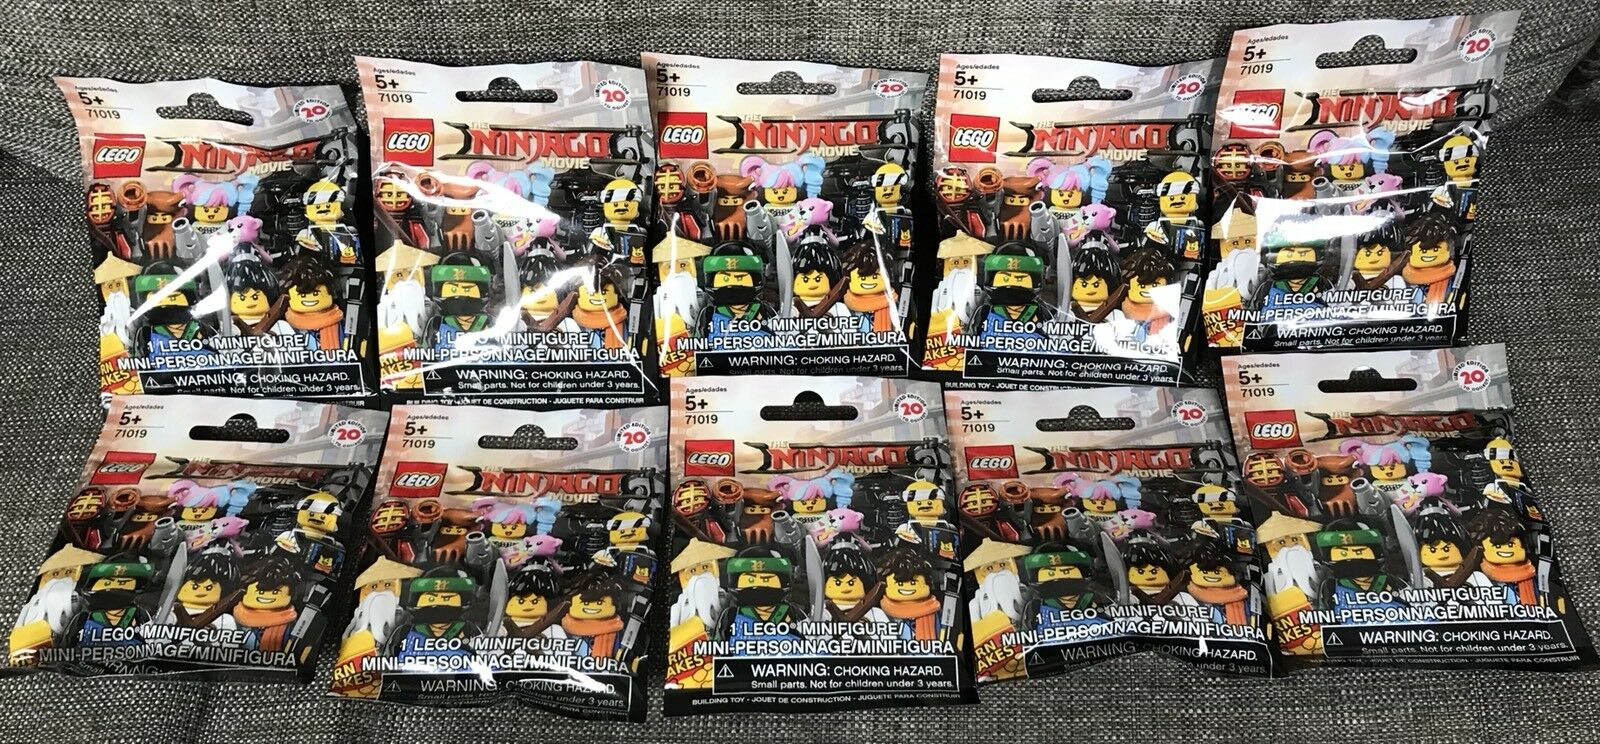 10 Bags OF LEGO NINJAGO Filmän Blind Bag begränsad Edition Mini Figur 71019